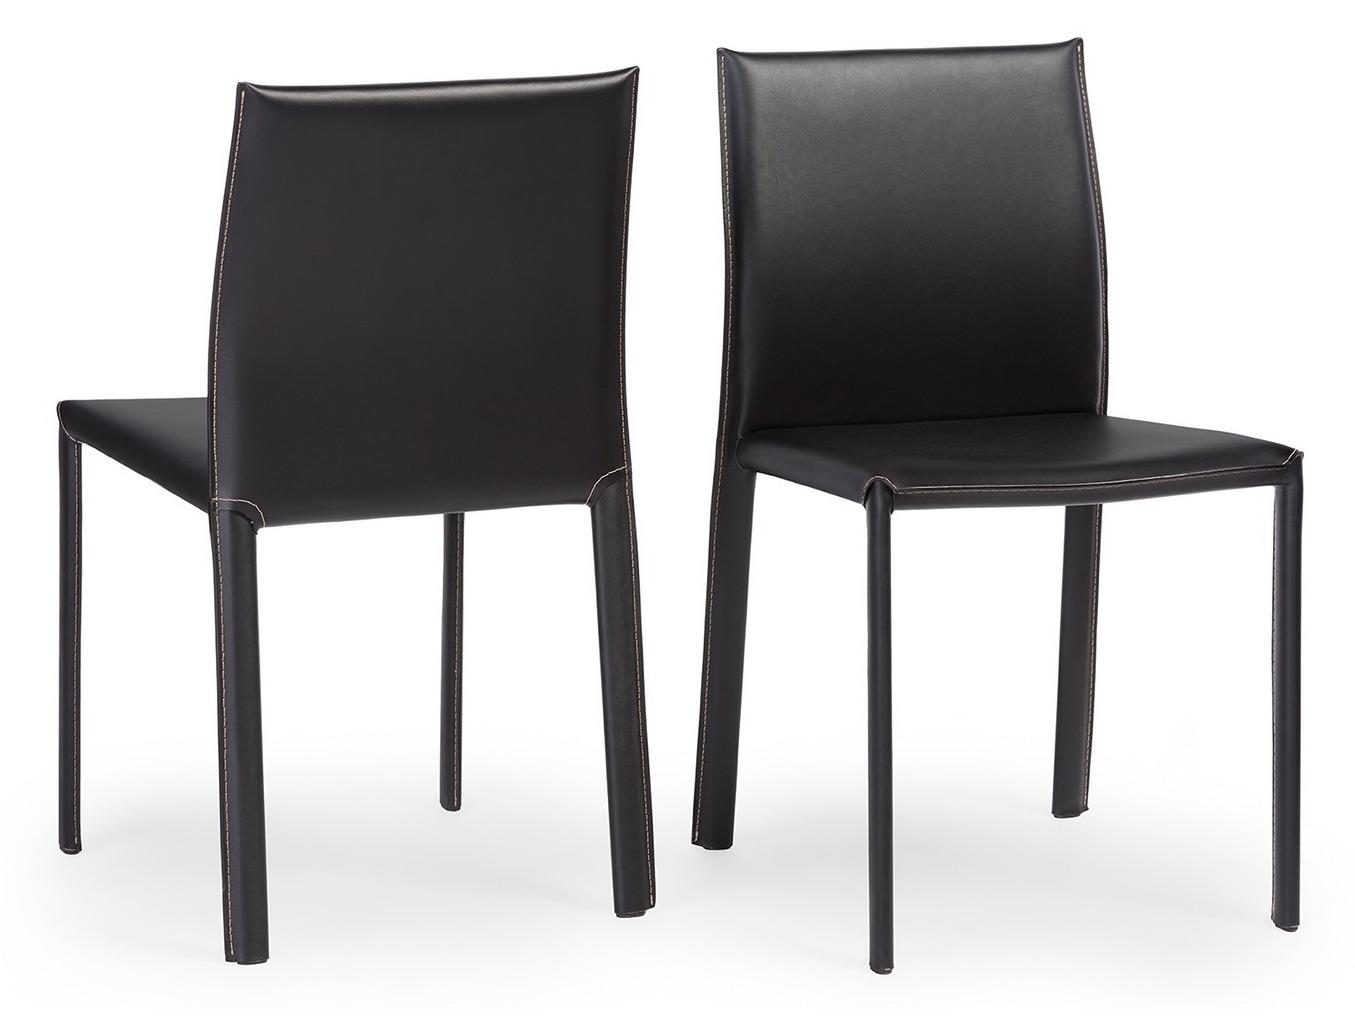 burridge-chair-in-black-leather-finish.jpg